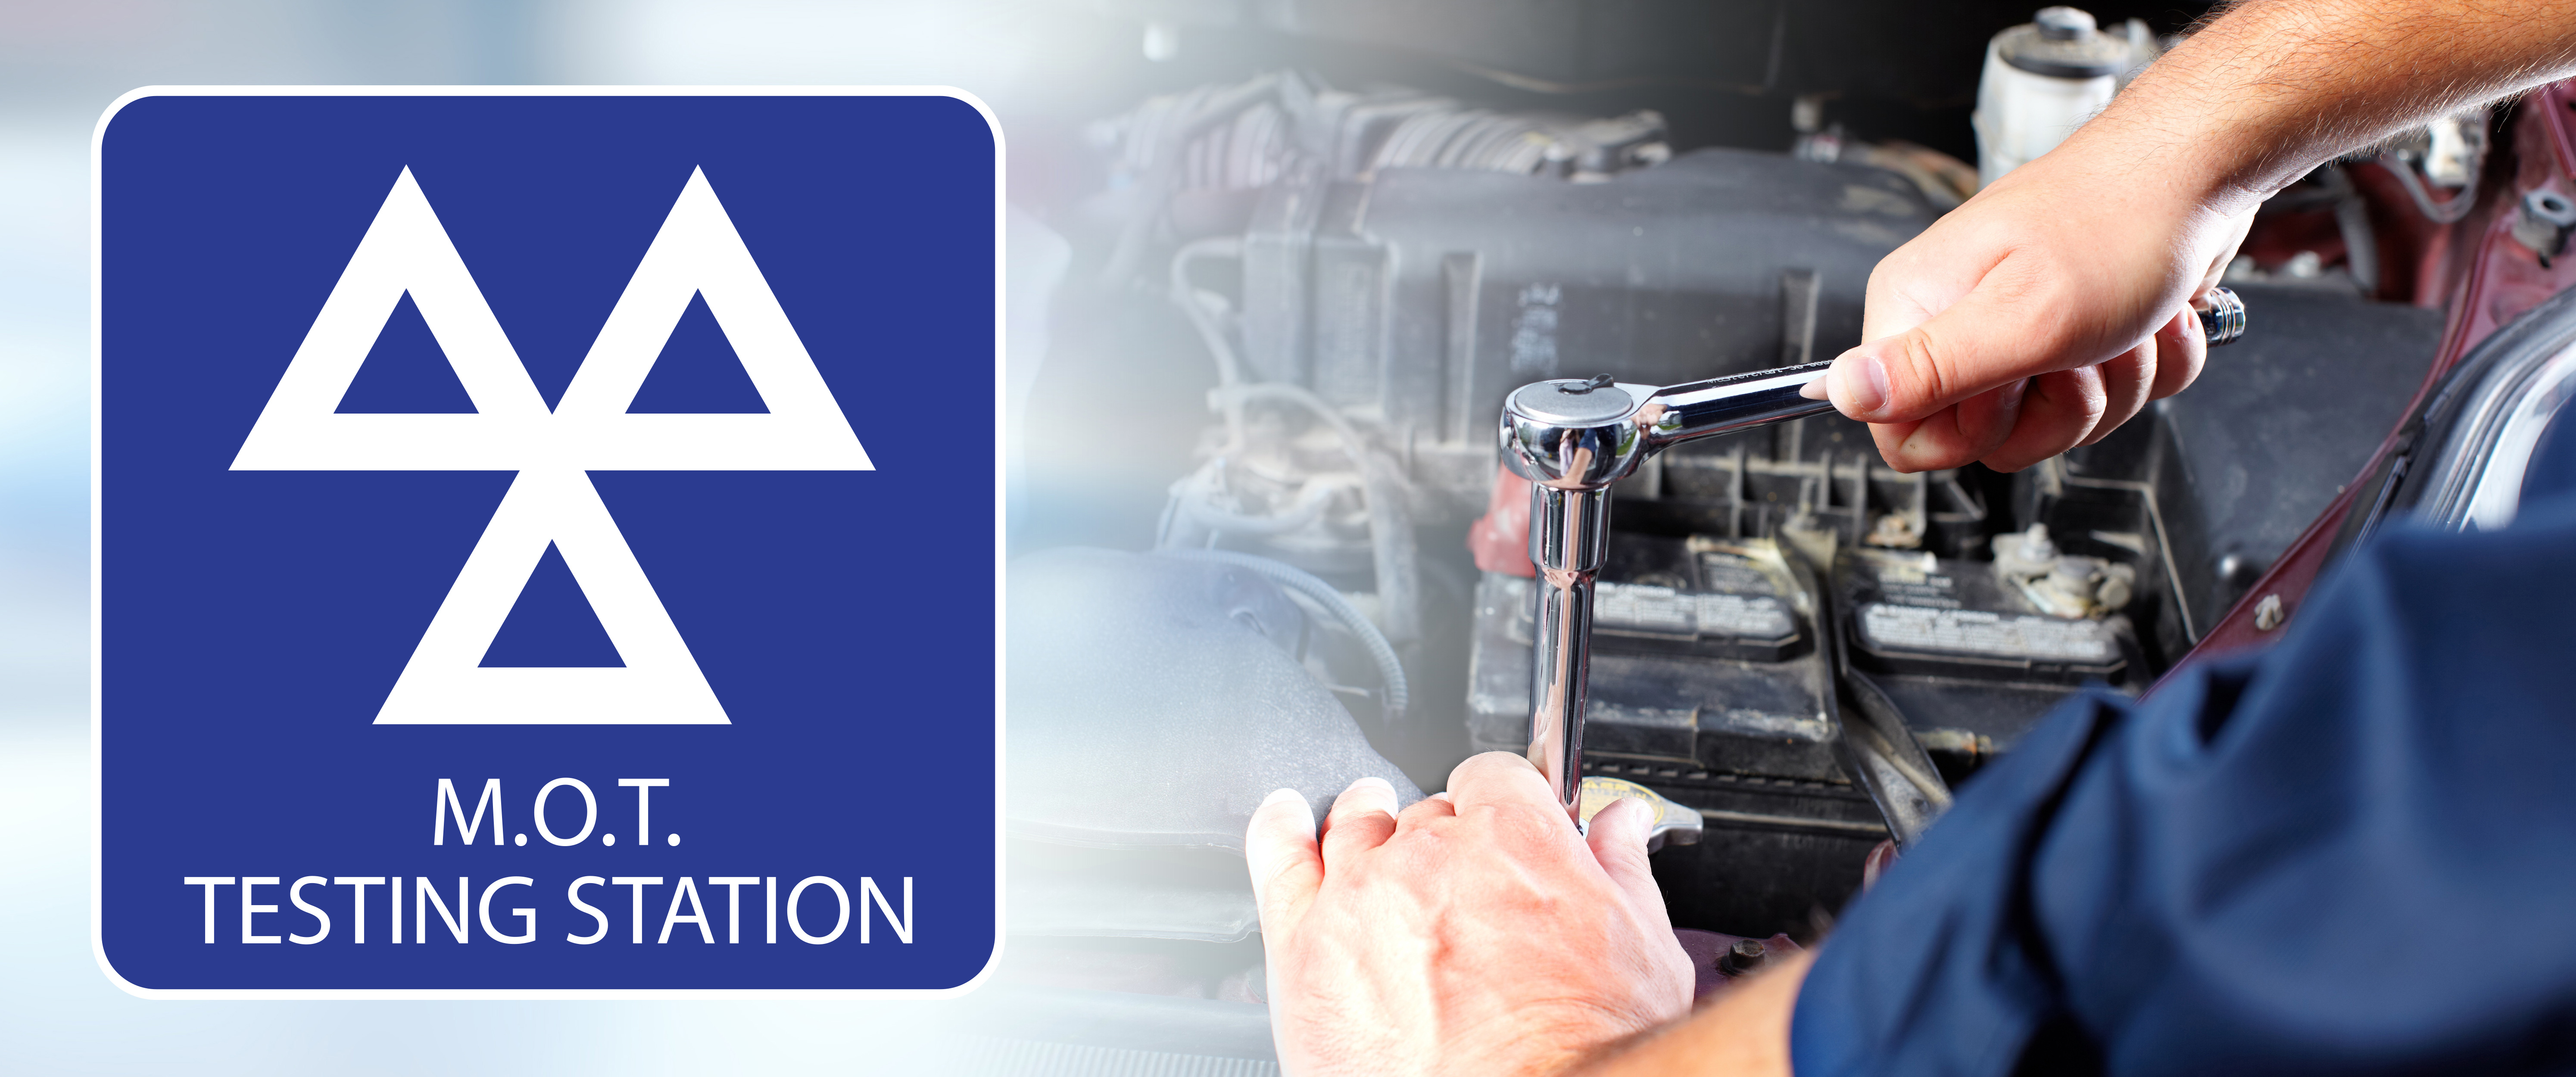 Hastings Volvo Servicing Repair Specialists